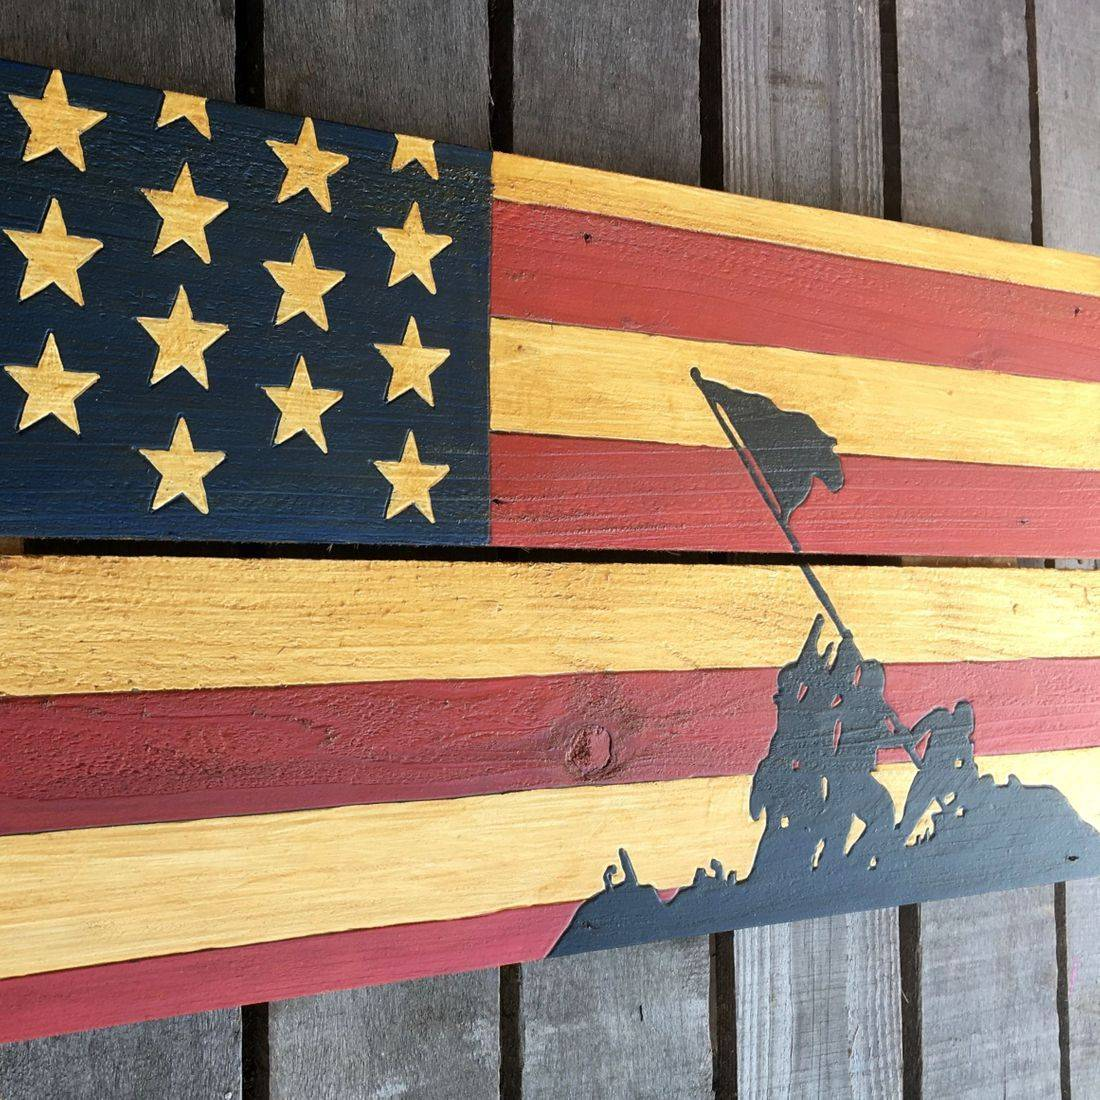 USA Handmade Reclaimed Pallet Wood American Military Iwo Jima Flag